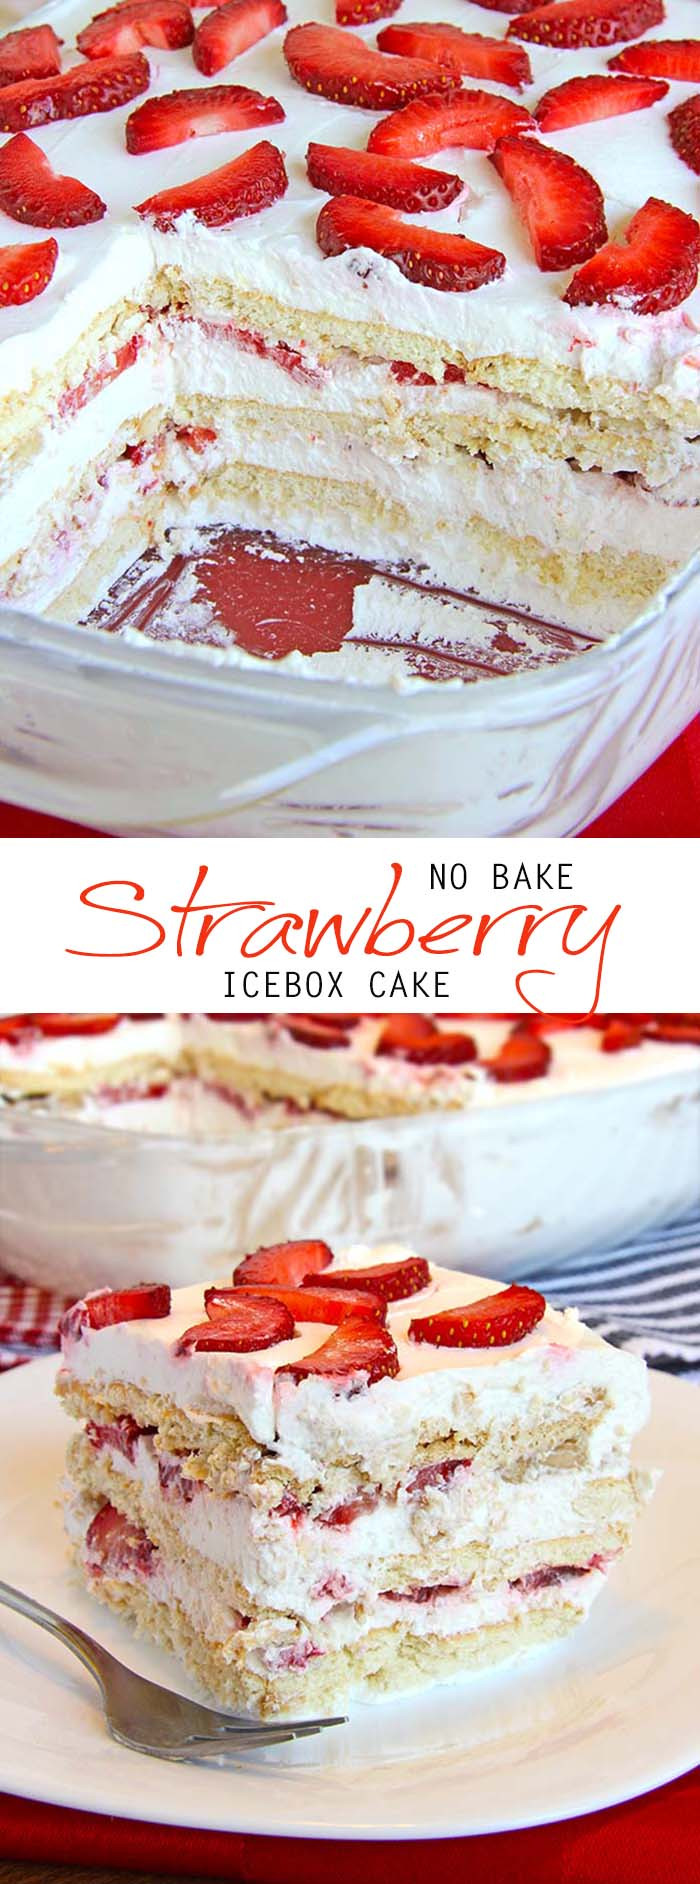 Summer Dessert Recipes  No Bake Strawberry Icebox Cake Cakescottage